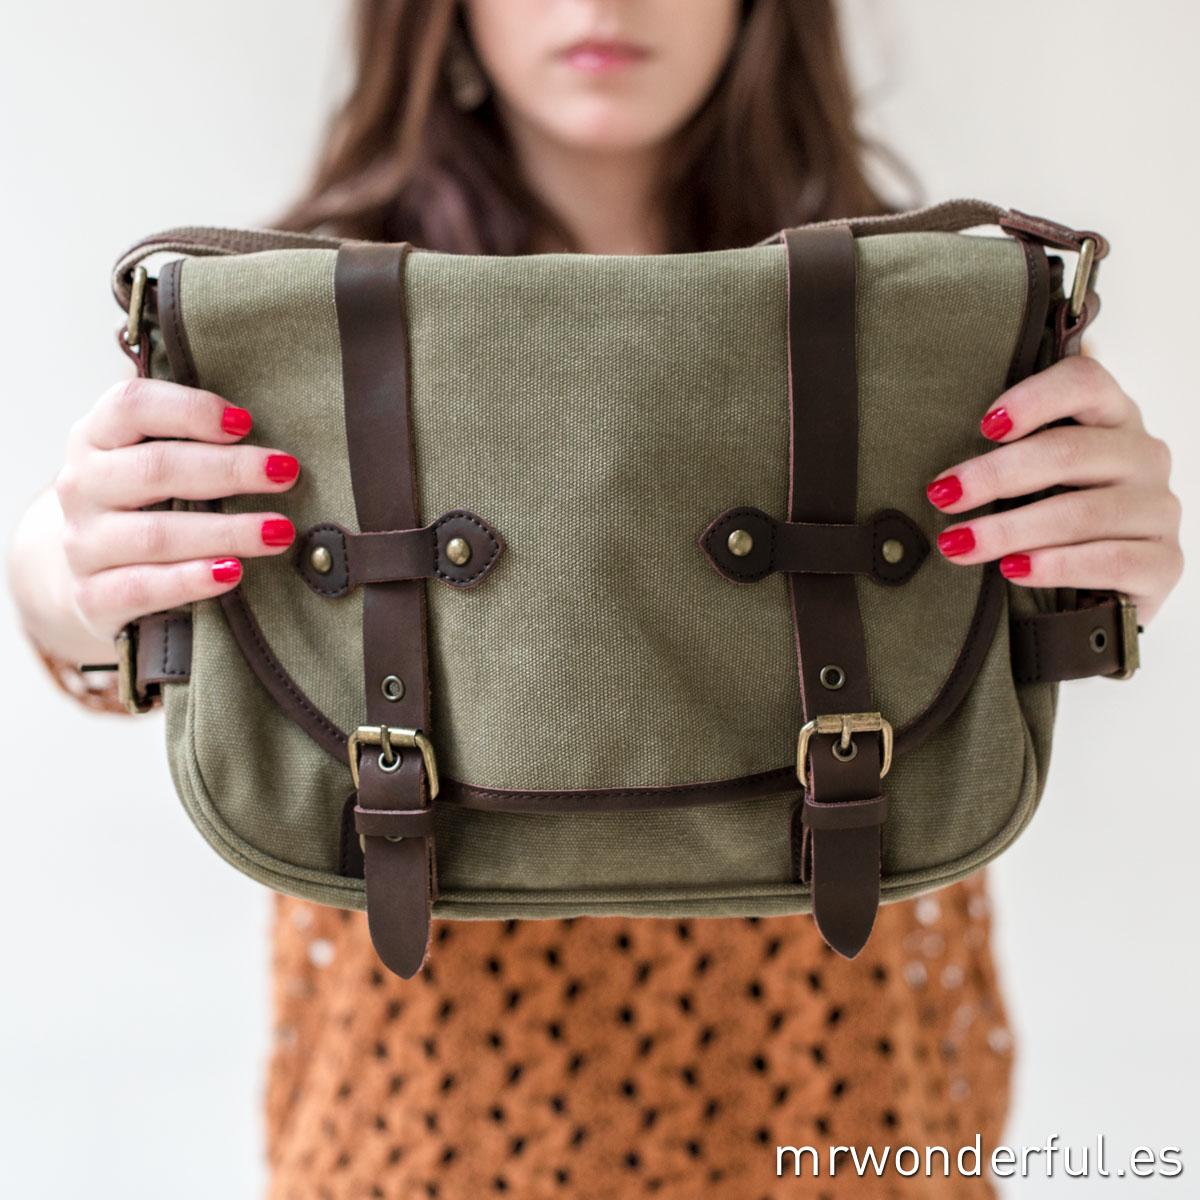 mrwonderful_bags_8050-1-Olive-59-Editar